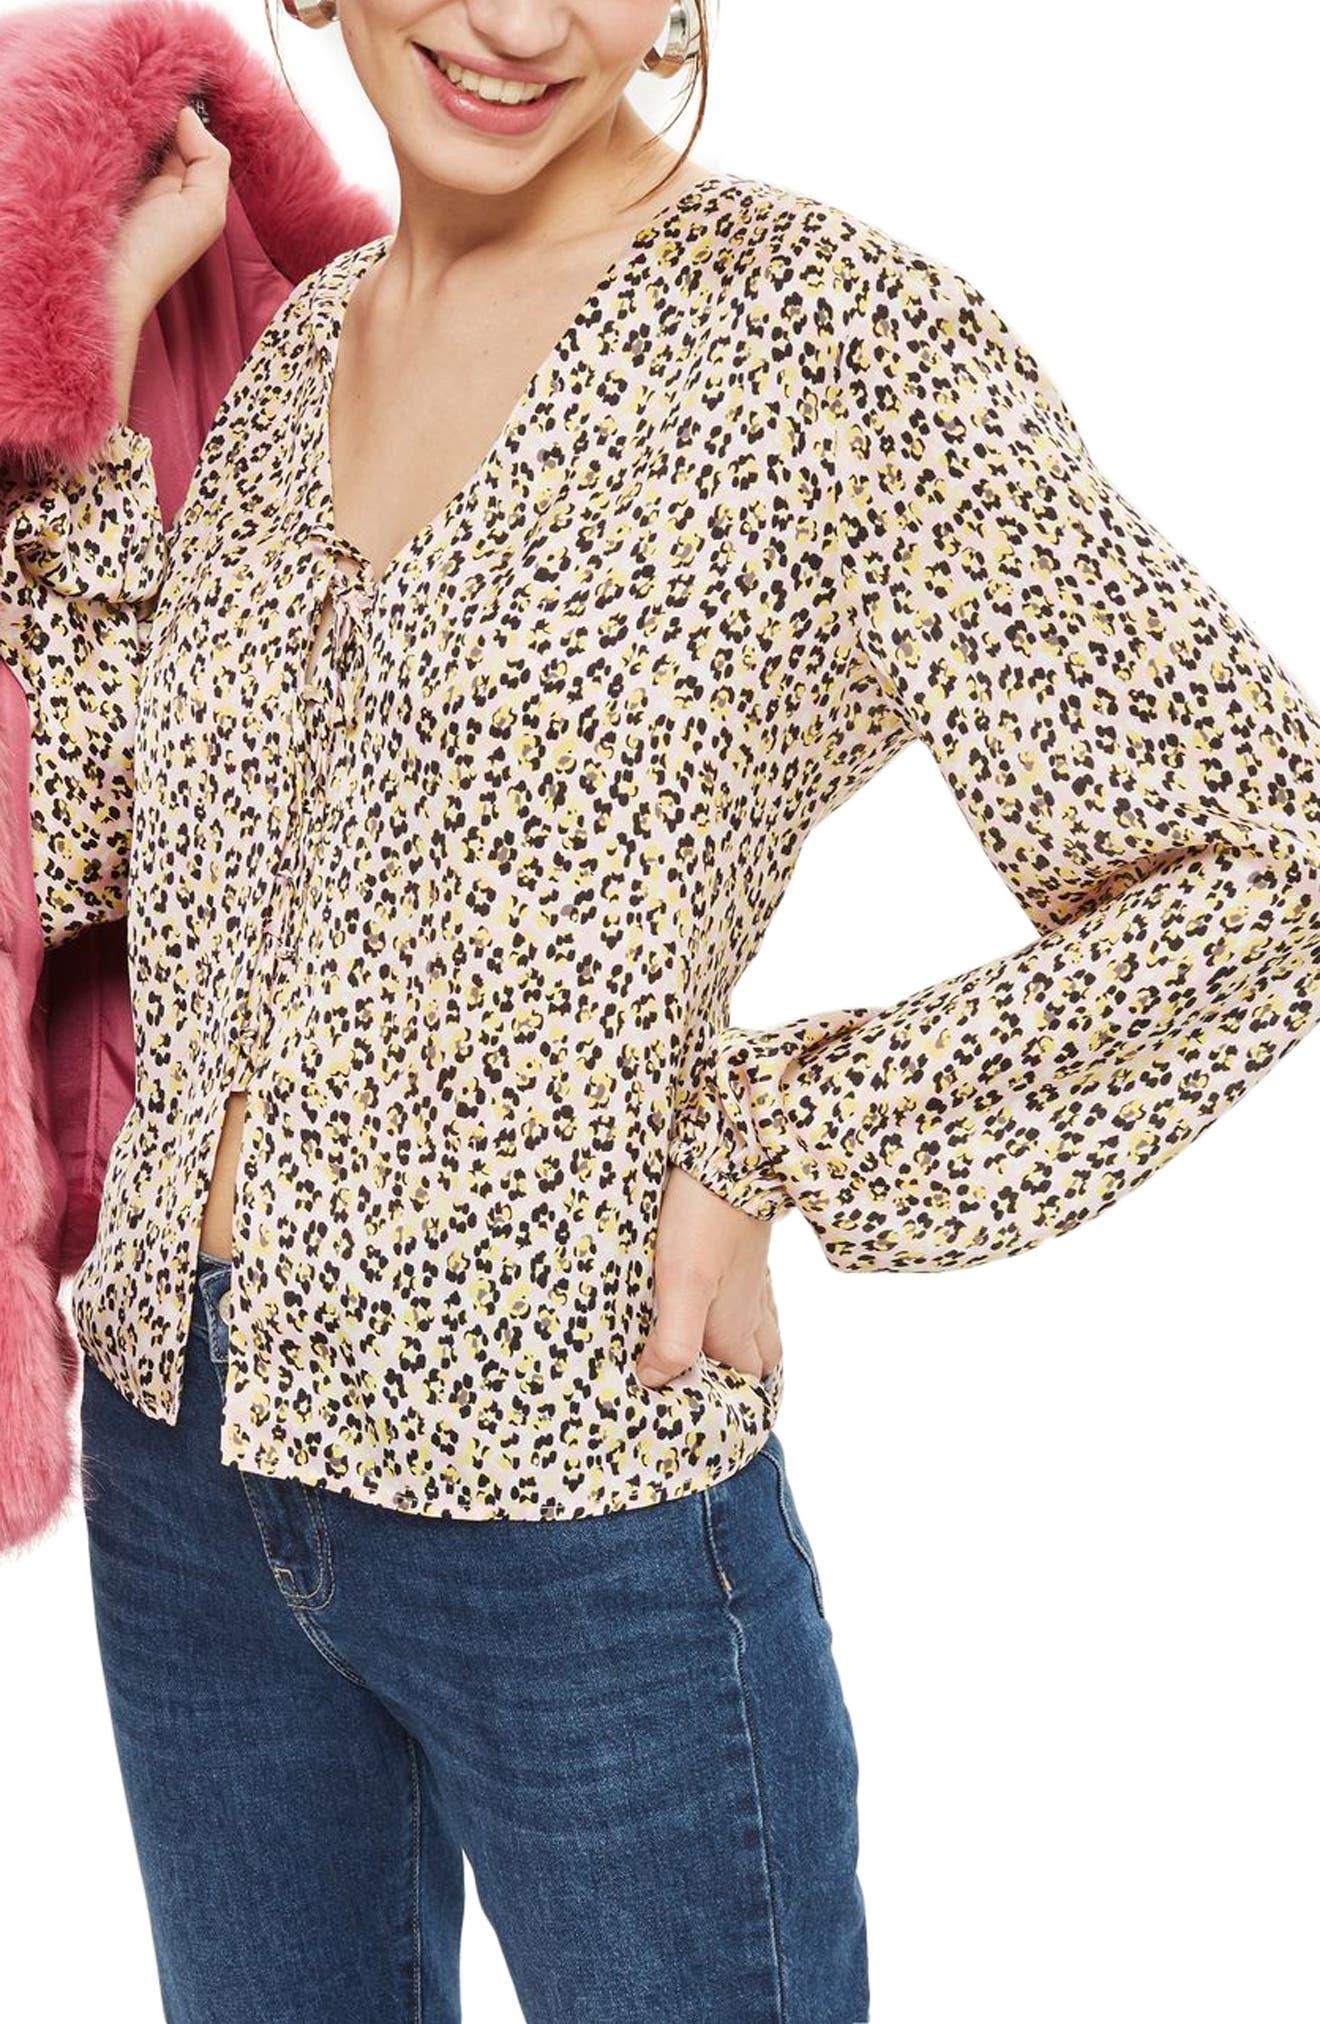 Alternate Image 1 Selected - Topshop Leopard Print Tie Front Blouse